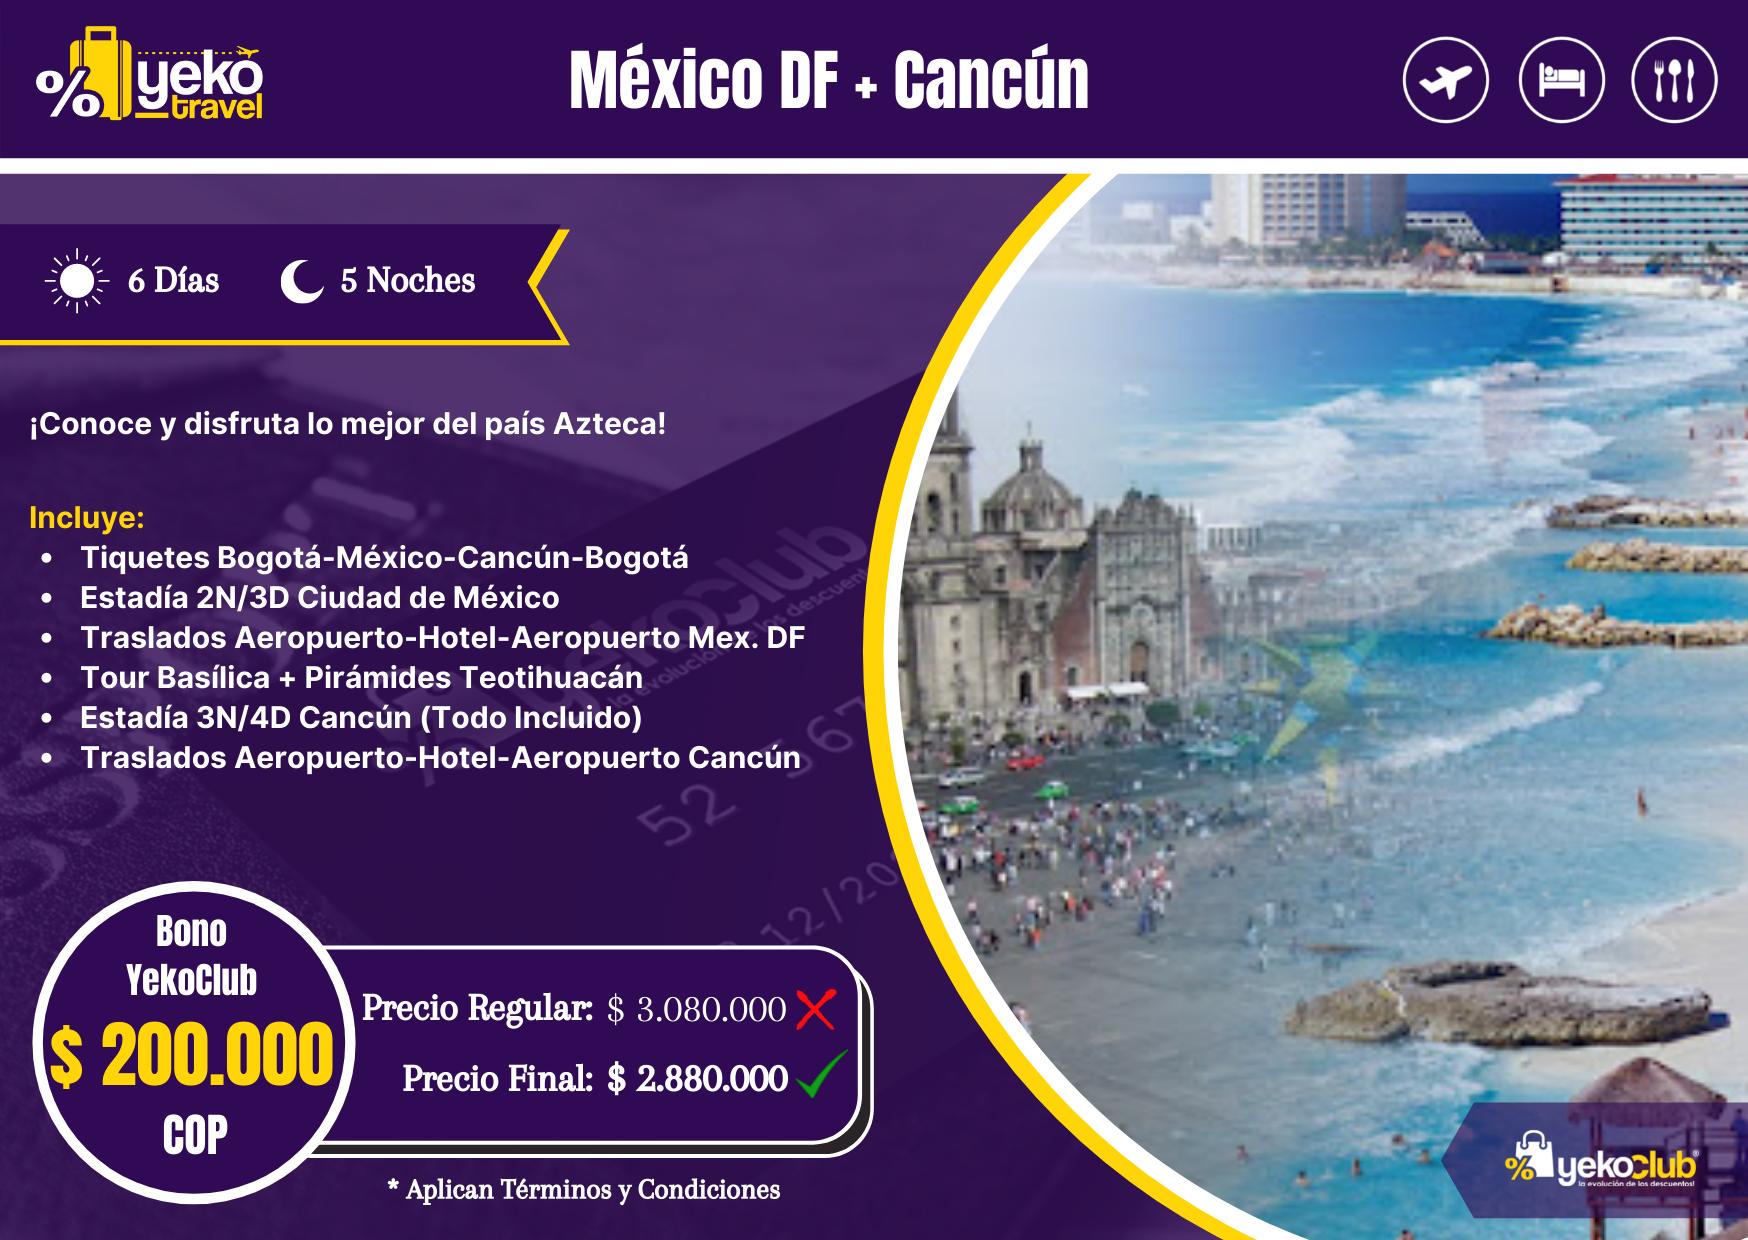 Mex DF + Cancún